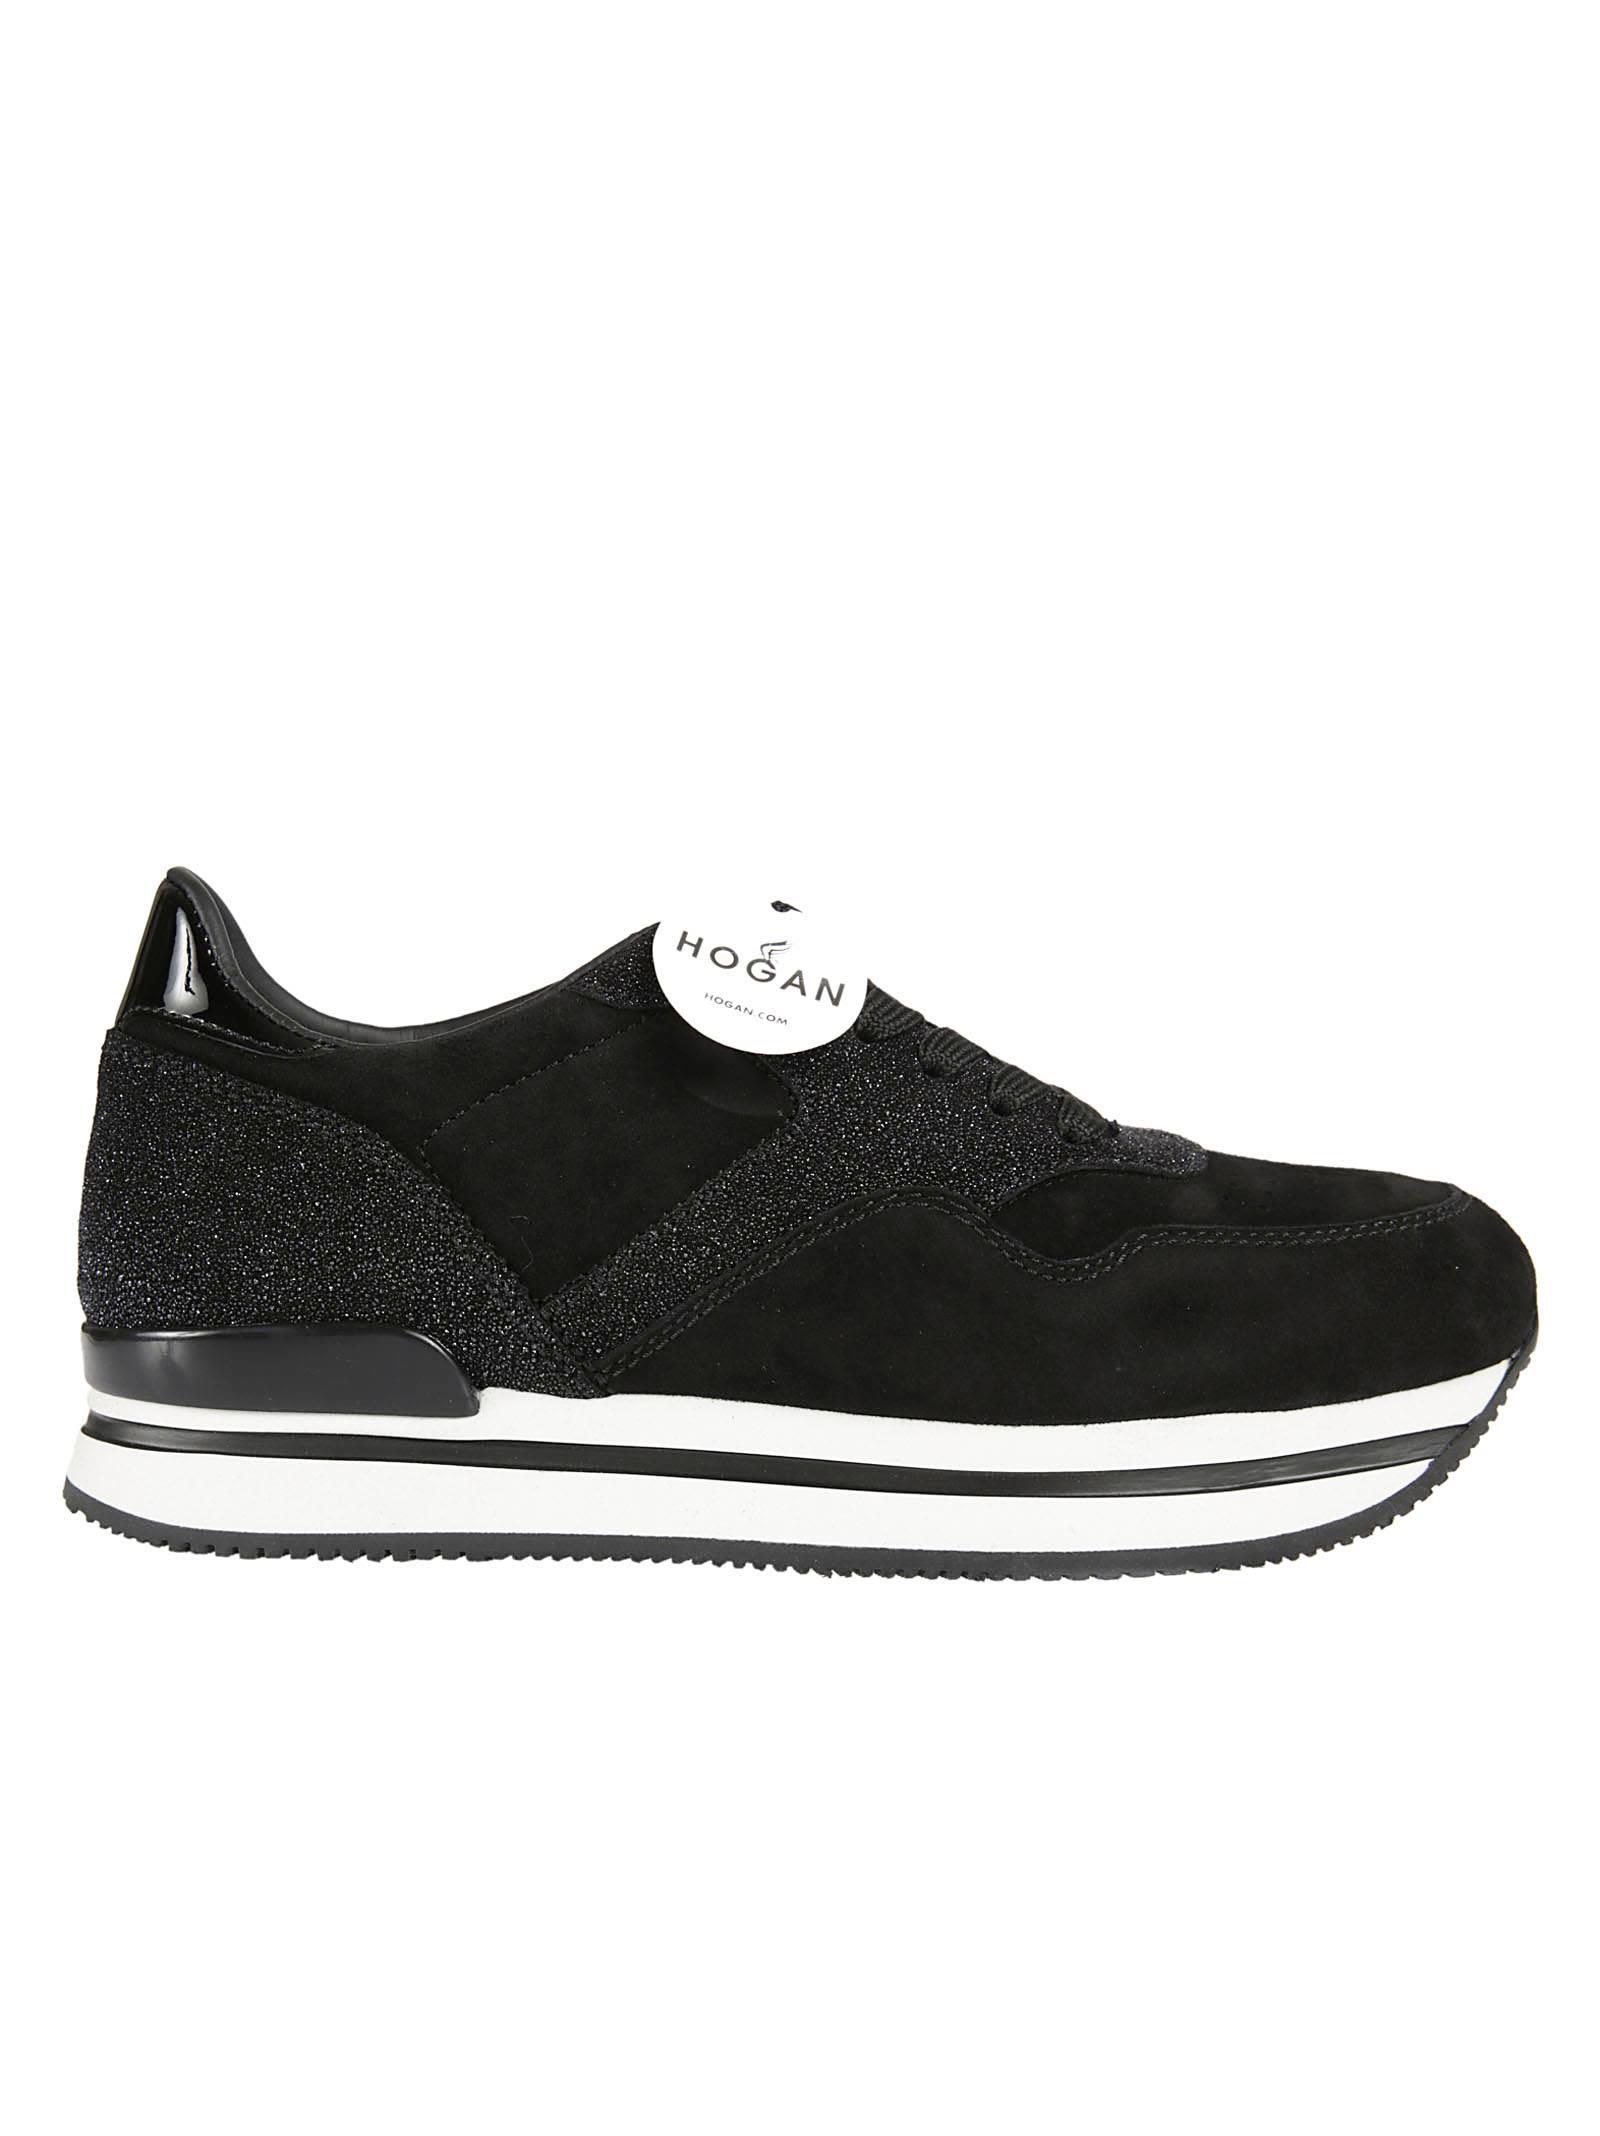 Hogan Glitter Detailed Platform Sneakers